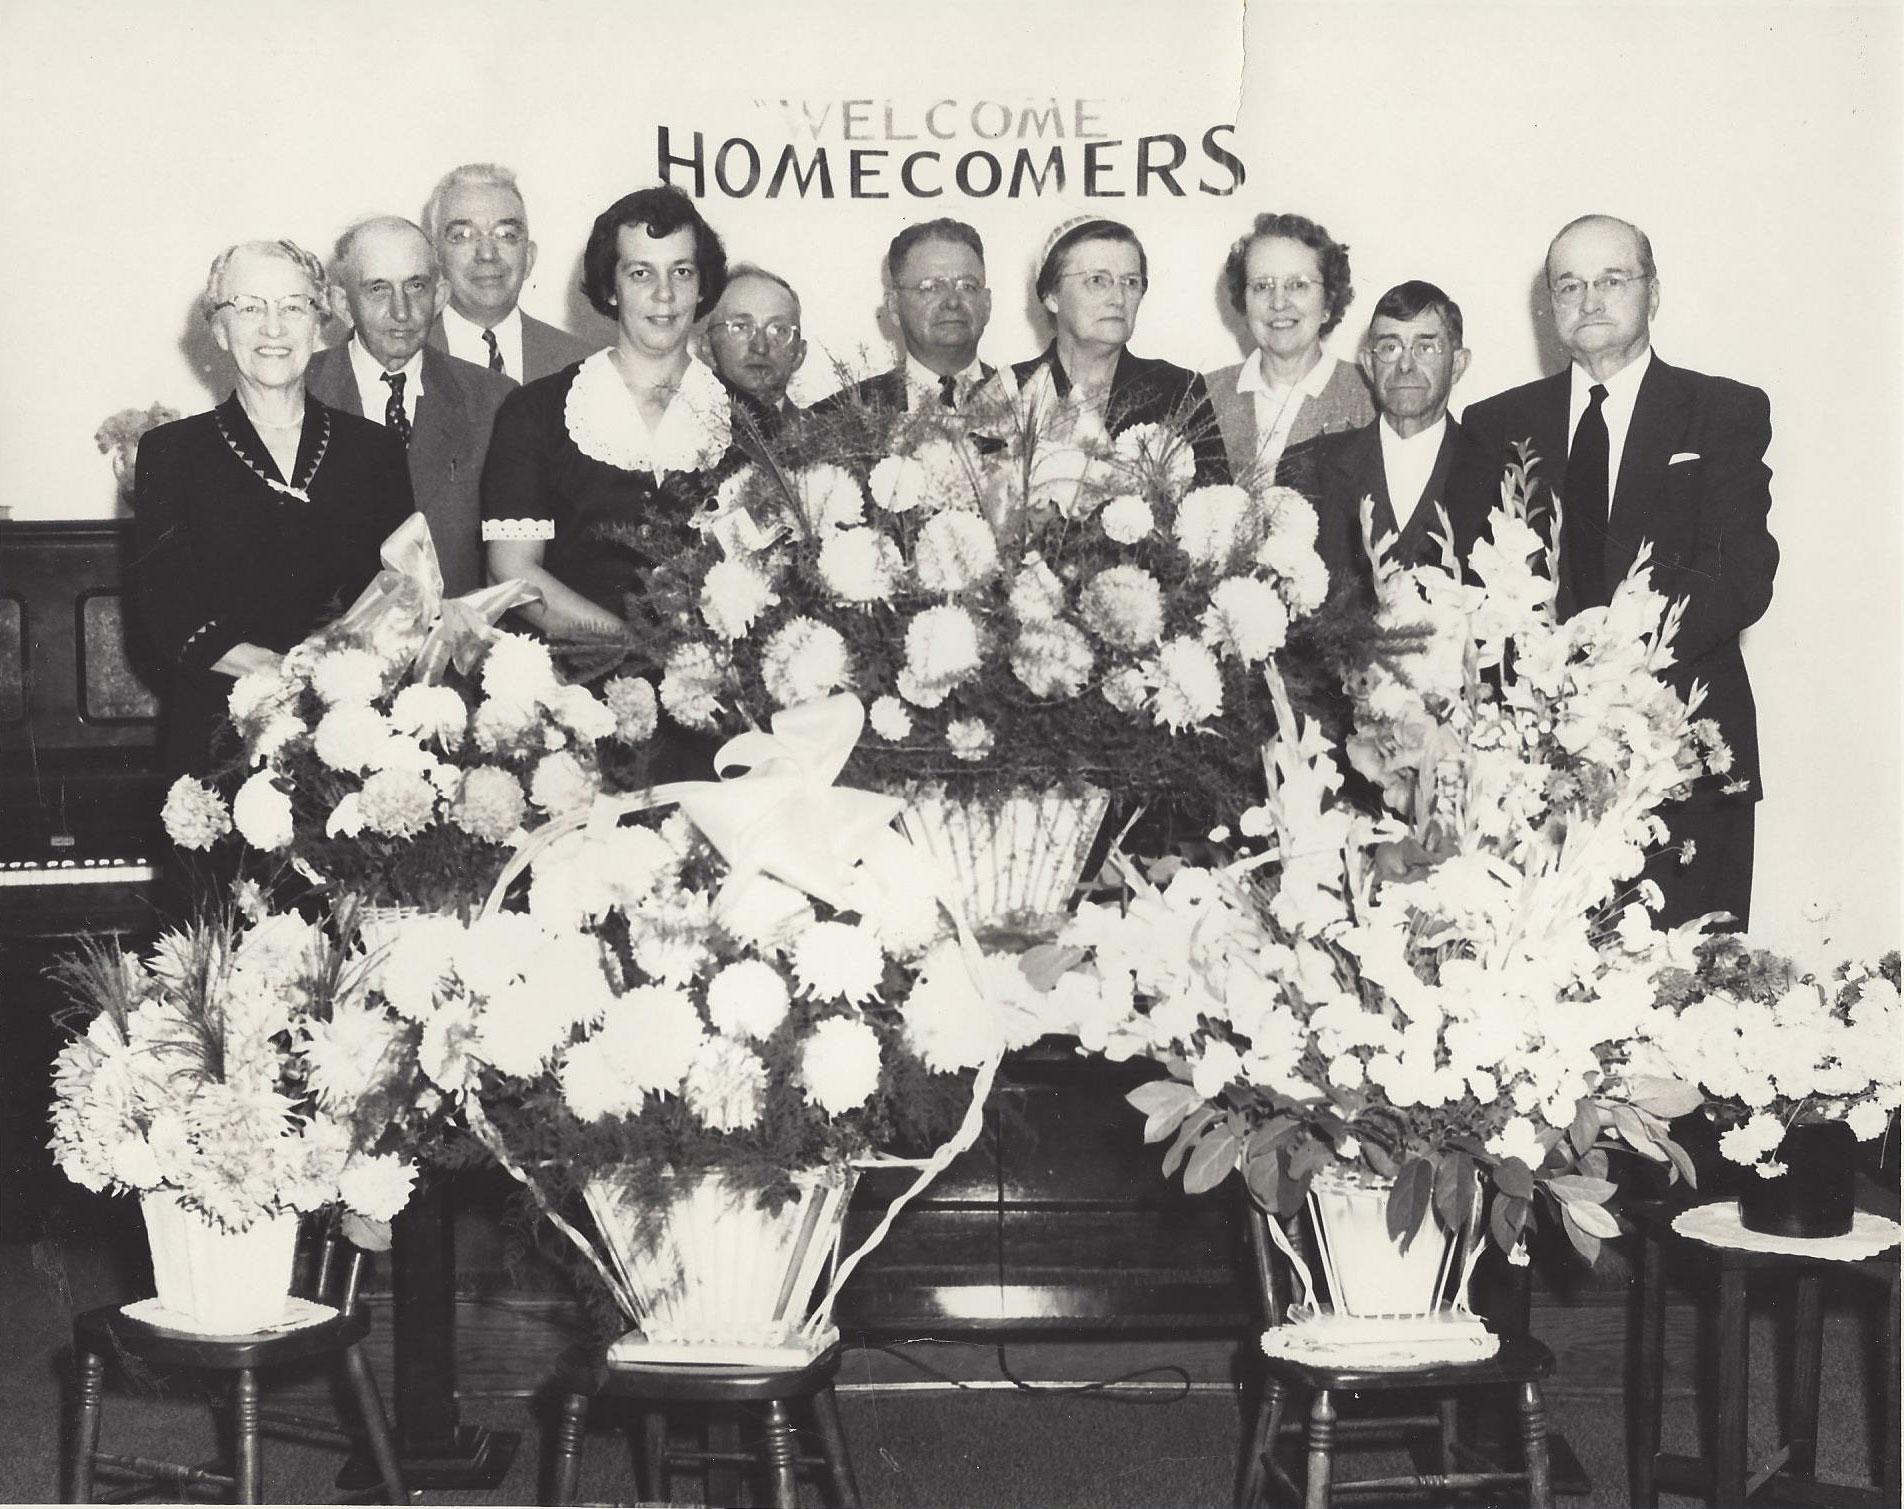 Pictured from left to right are: Rhoda Schildt Green, John Fogle, D.S. Weybright, Martha Fogle Dayhoff, Steiner Whitmore, James Renner, Denda Renner, Ruth Weybright Stauffer, Clarence Putnam, Sam Weybright